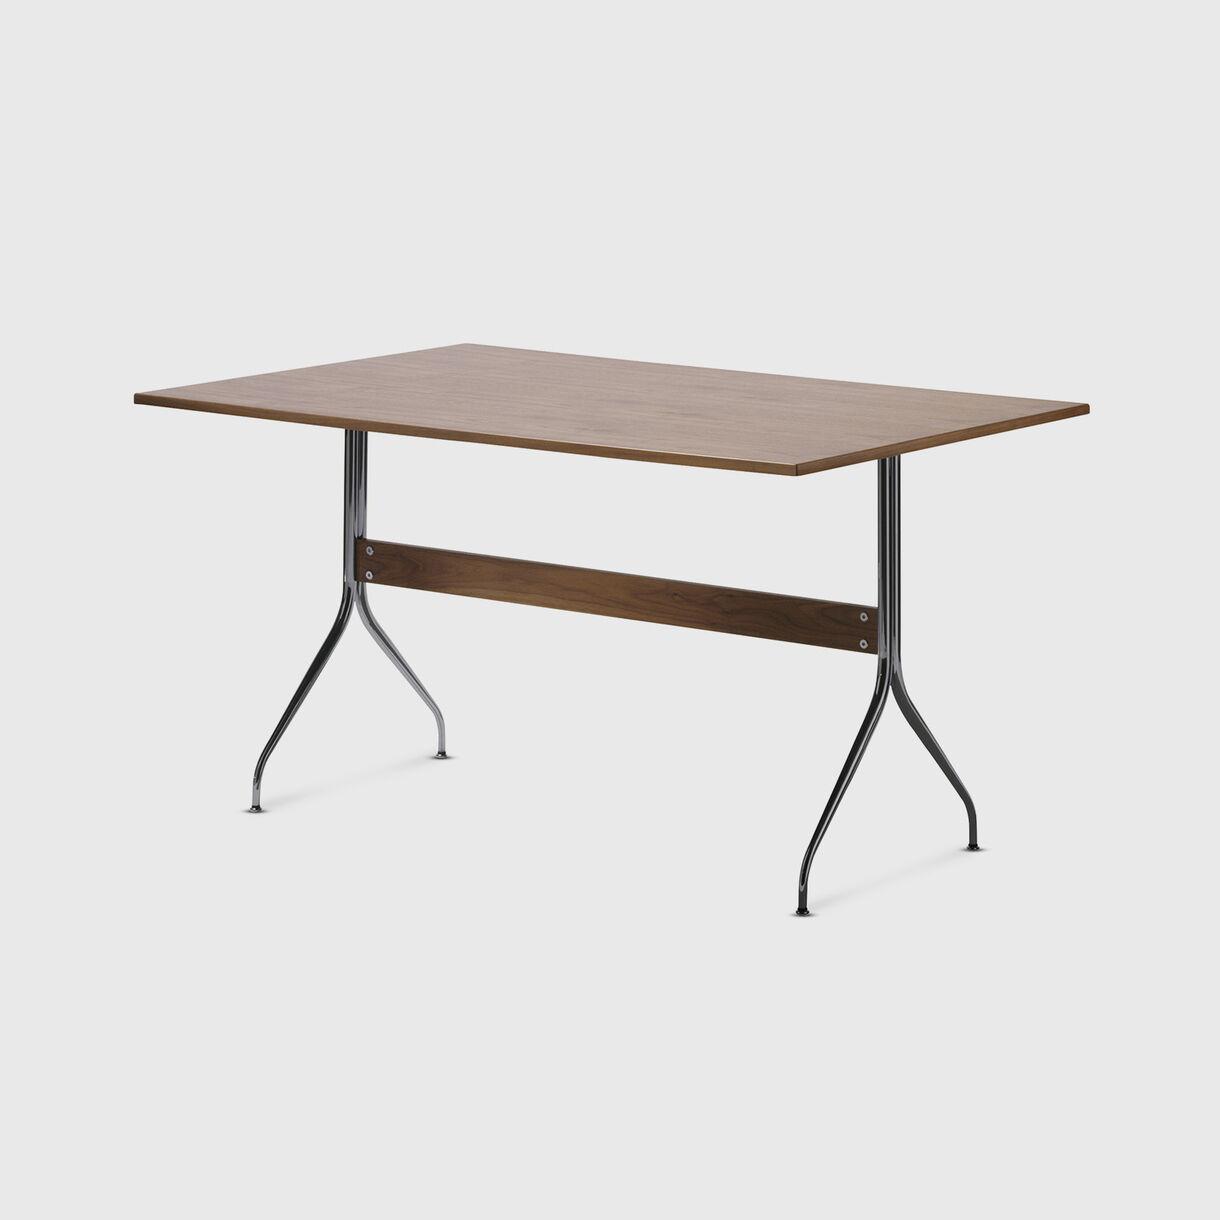 Nelson Swag Leg Work Table, Walnut Top